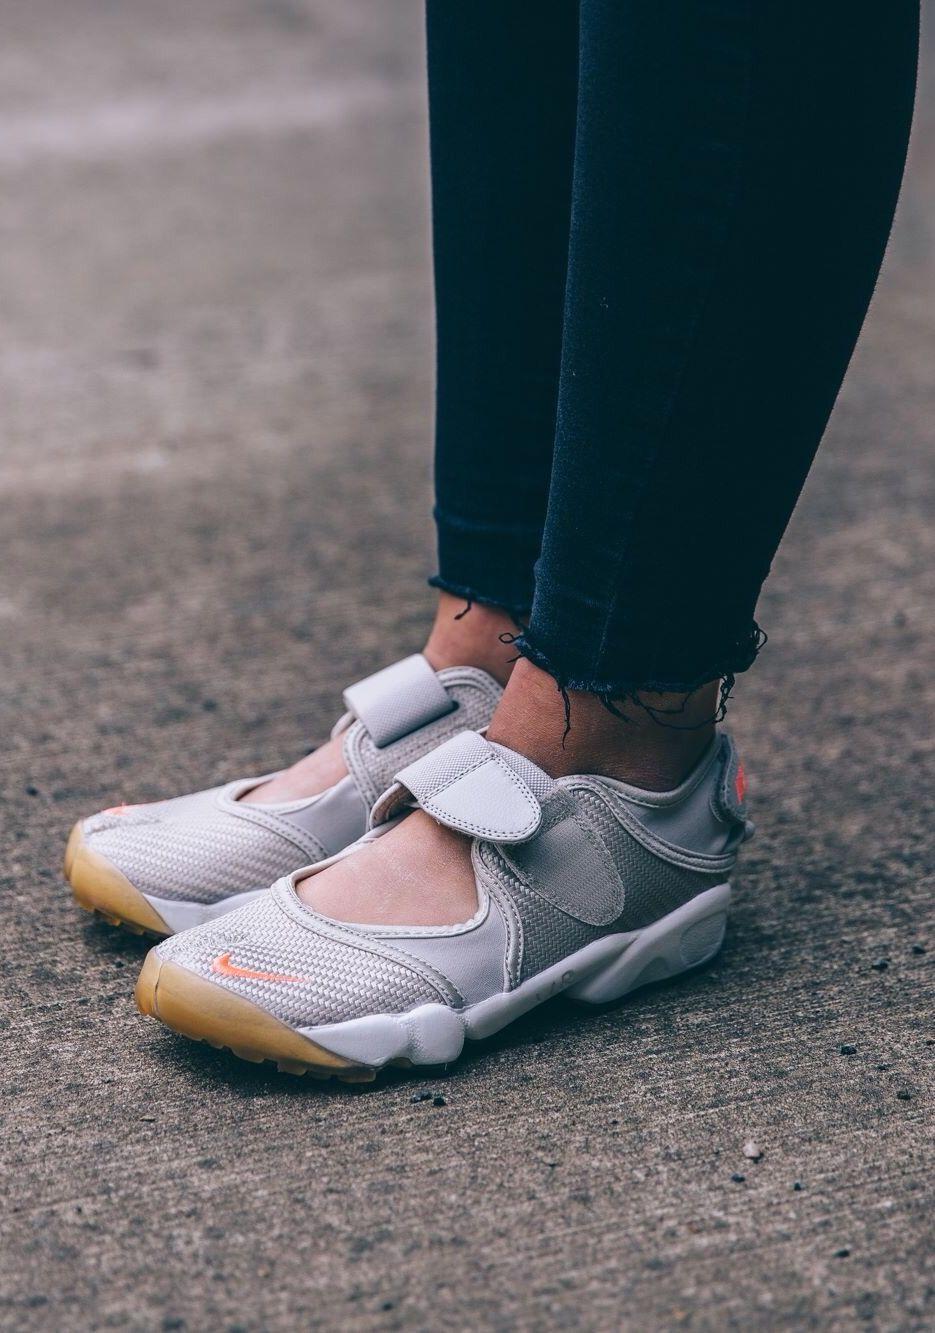 3fe97bd7eaa Nike Air Rift | Sneakers: Nike Air Rift | Nike air rift, Sneakers ...